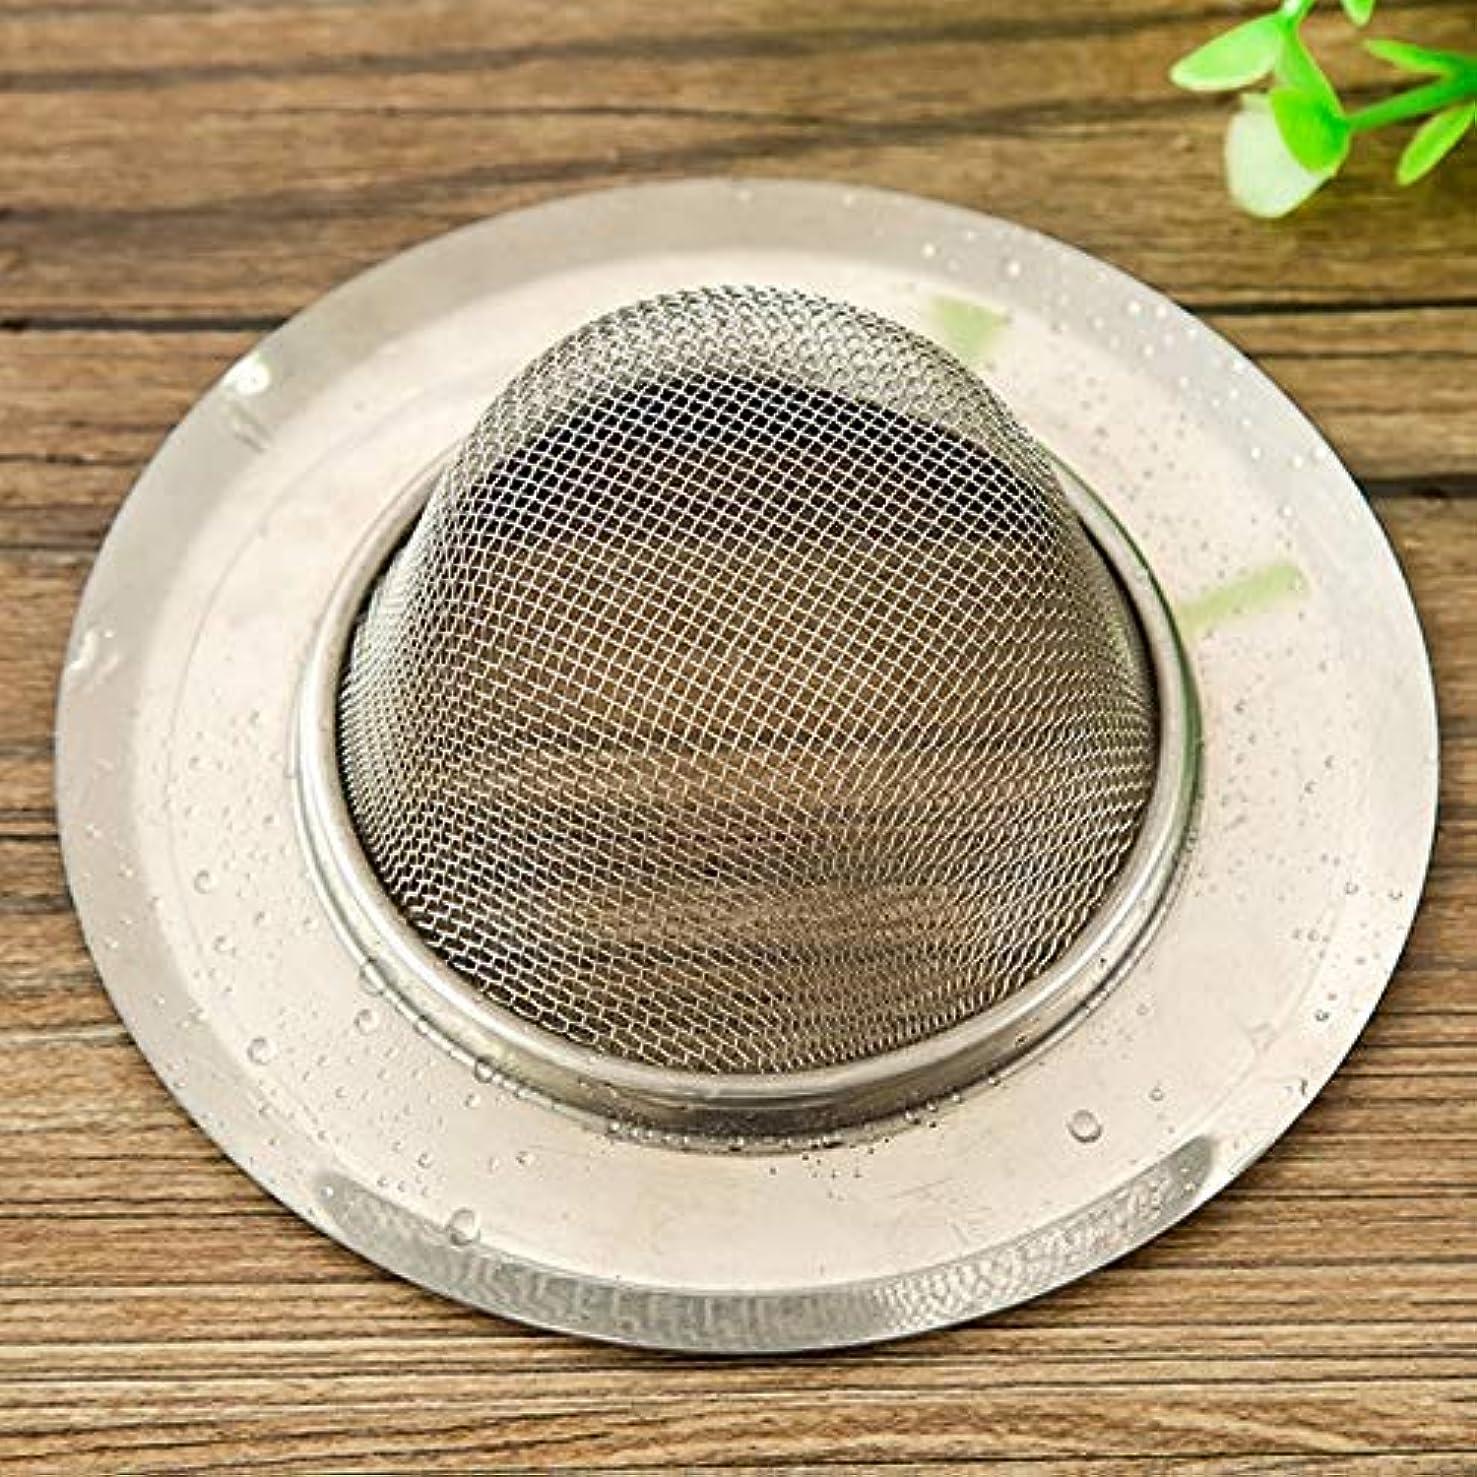 Ochoos Stainless Steel Sewer Filter Mesh Sink Strainer kitchen Bathroom Bathtub Floor Sink Drain Hair Catcher Stopper Filter Cover - (Color: 11cm B)